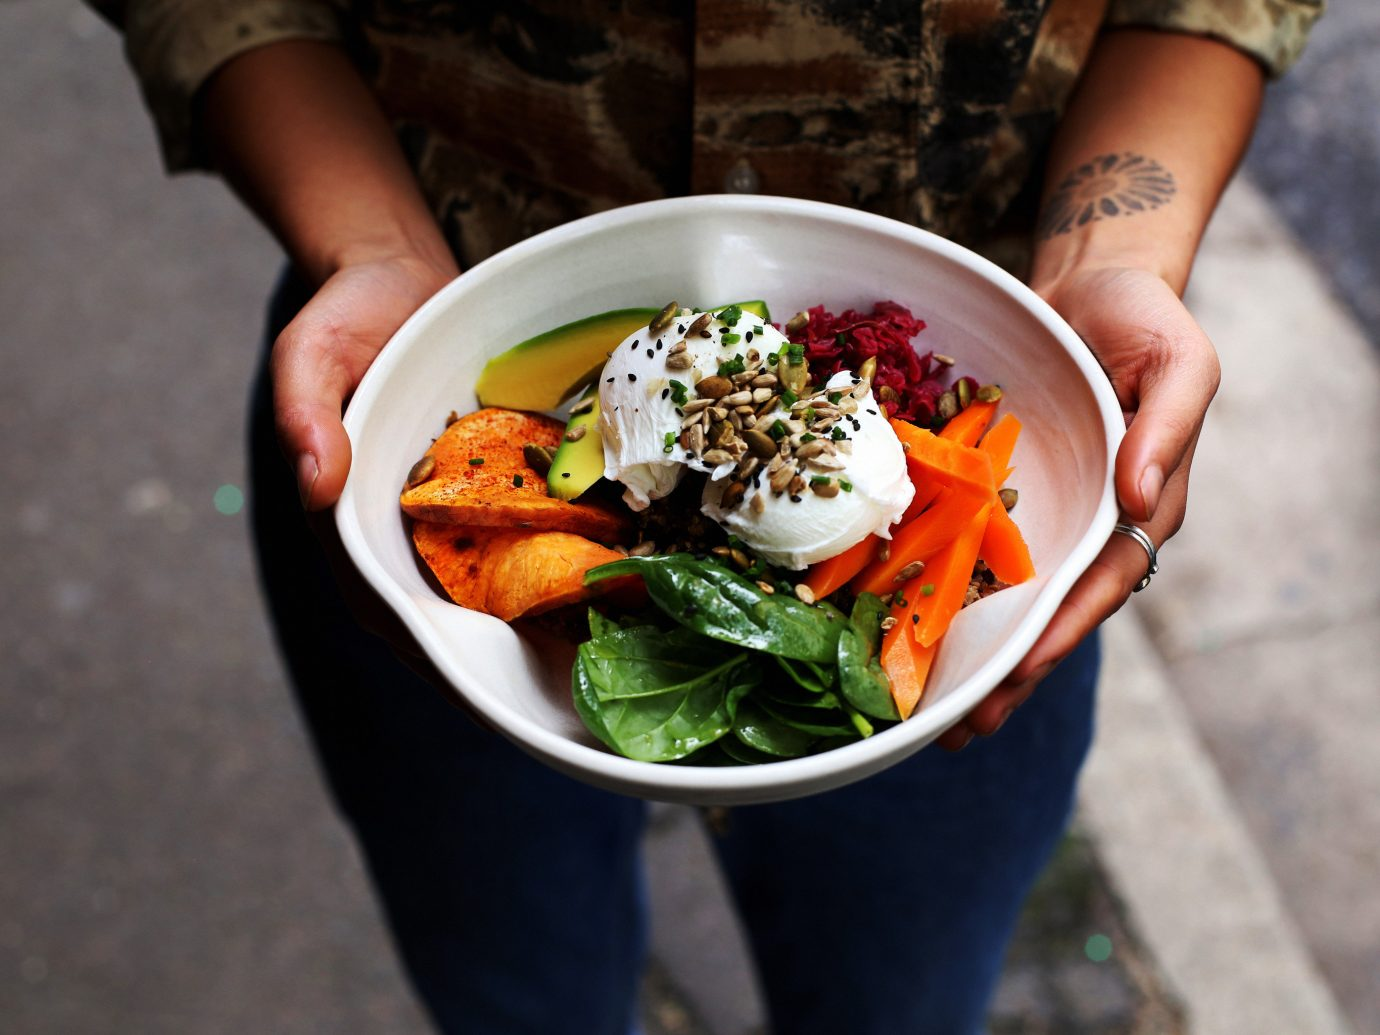 Food + Drink Offbeat Travel Trends person food dish meal brunch cuisine lunch vegetarian food vegetable breakfast recipe